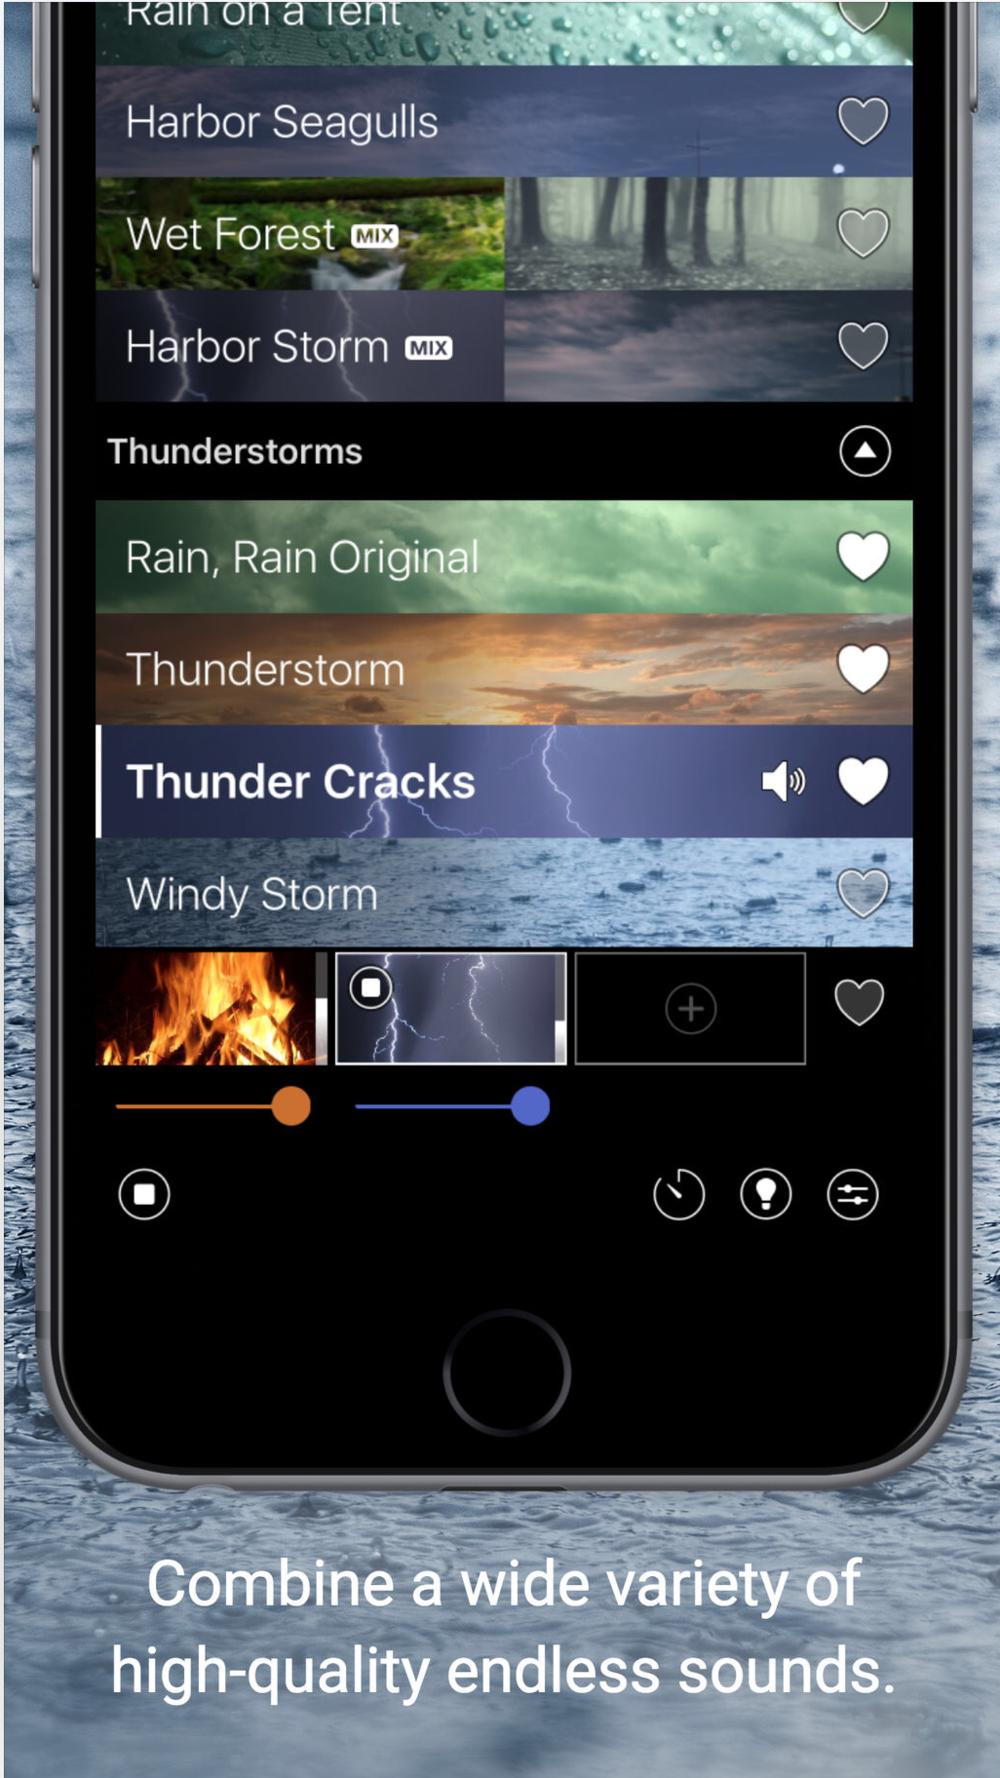 sam-c-perry-3-products-that-will-help-you-sleep-better-rain-rain-app-image-2.jpg